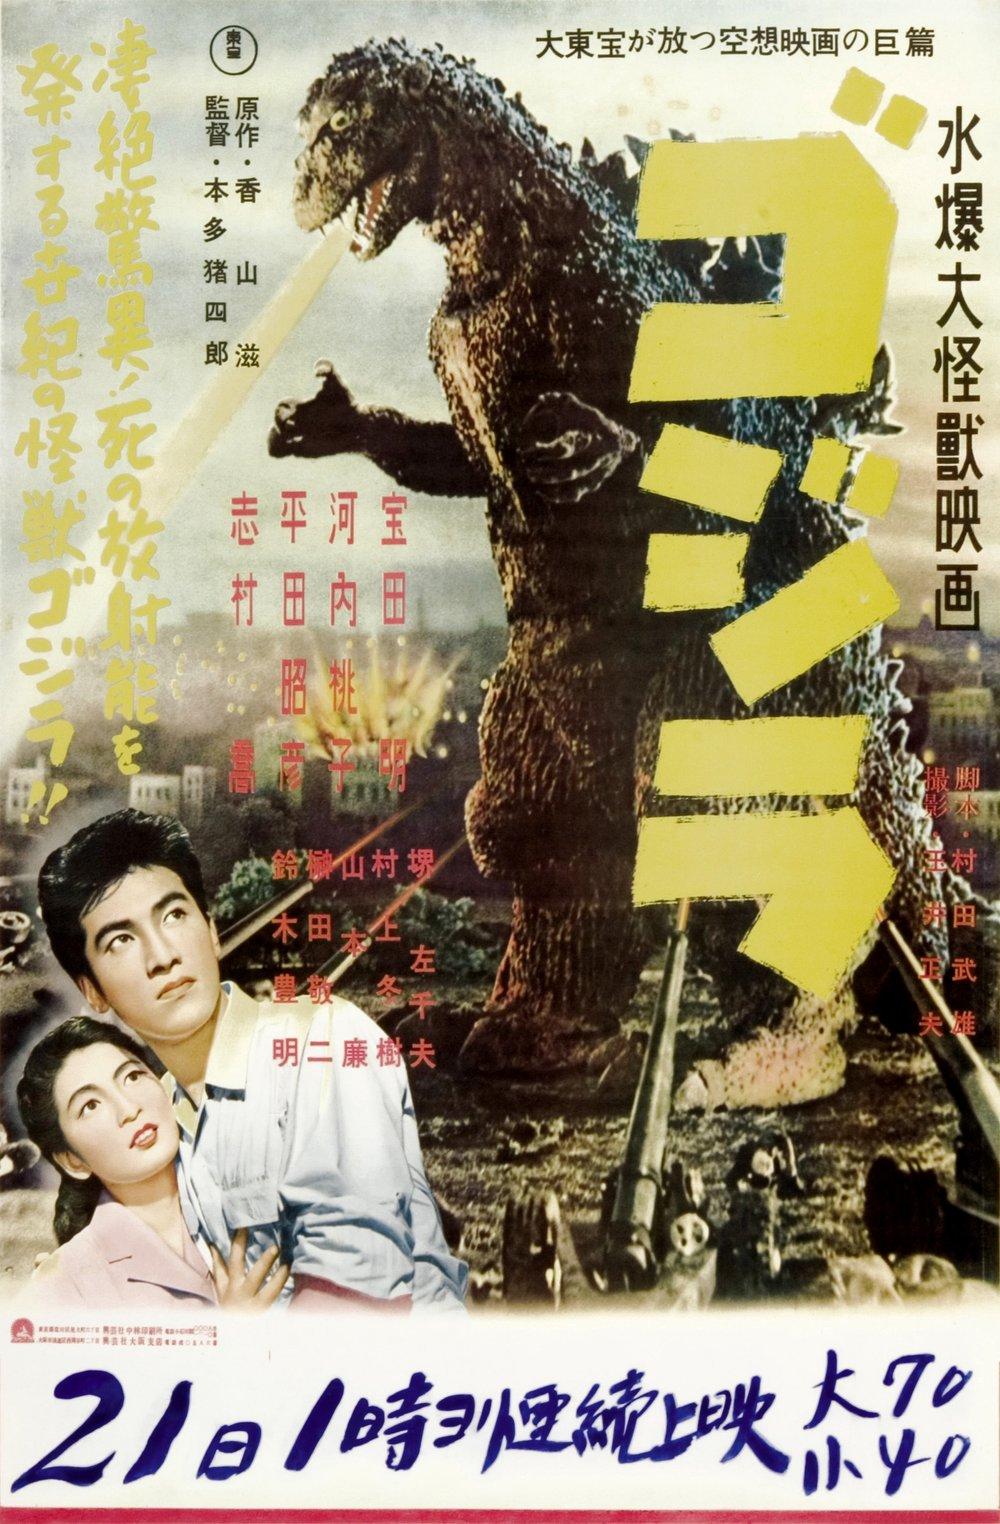 Gojira_1954_poster_3.jpg